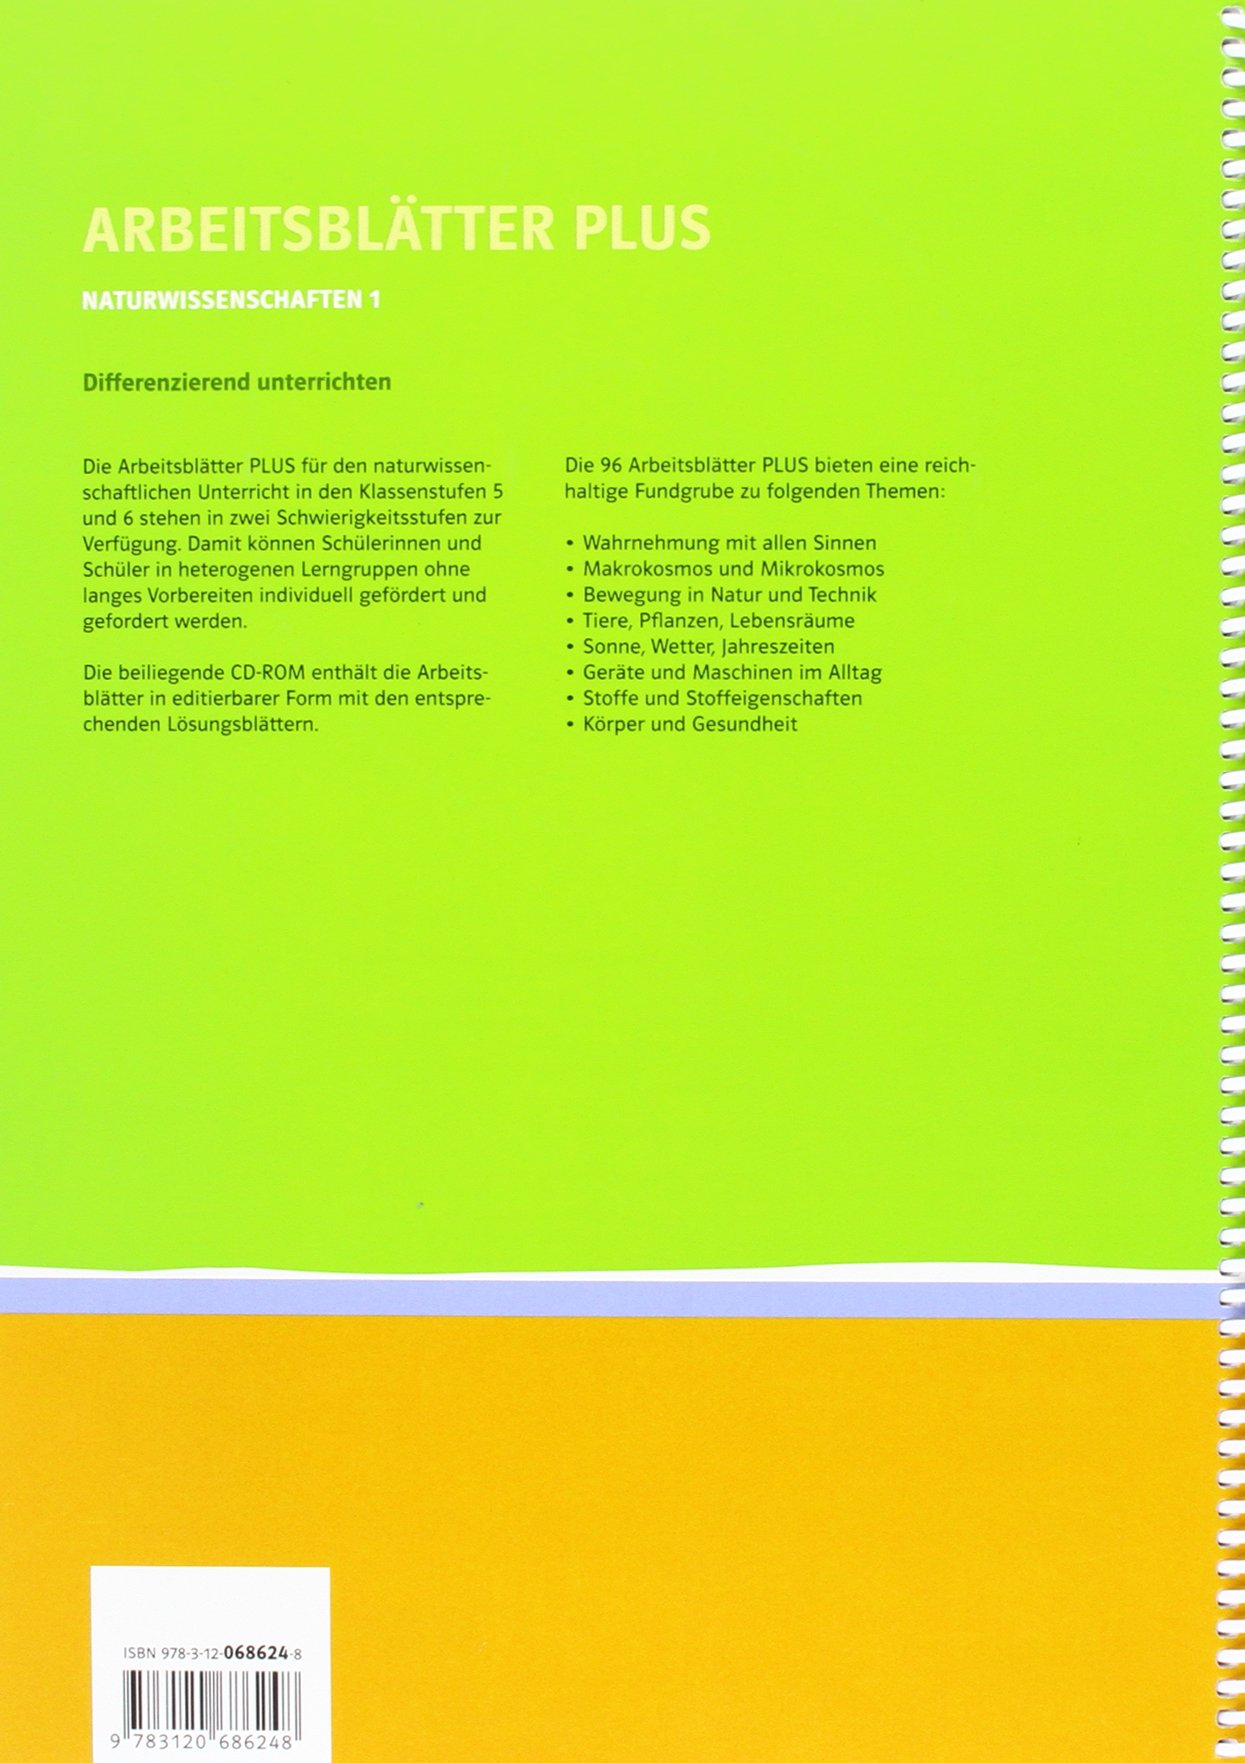 Wunderbar Klasse 9 Naturwissenschaft Arbeitsblatt Fotos - Super ...